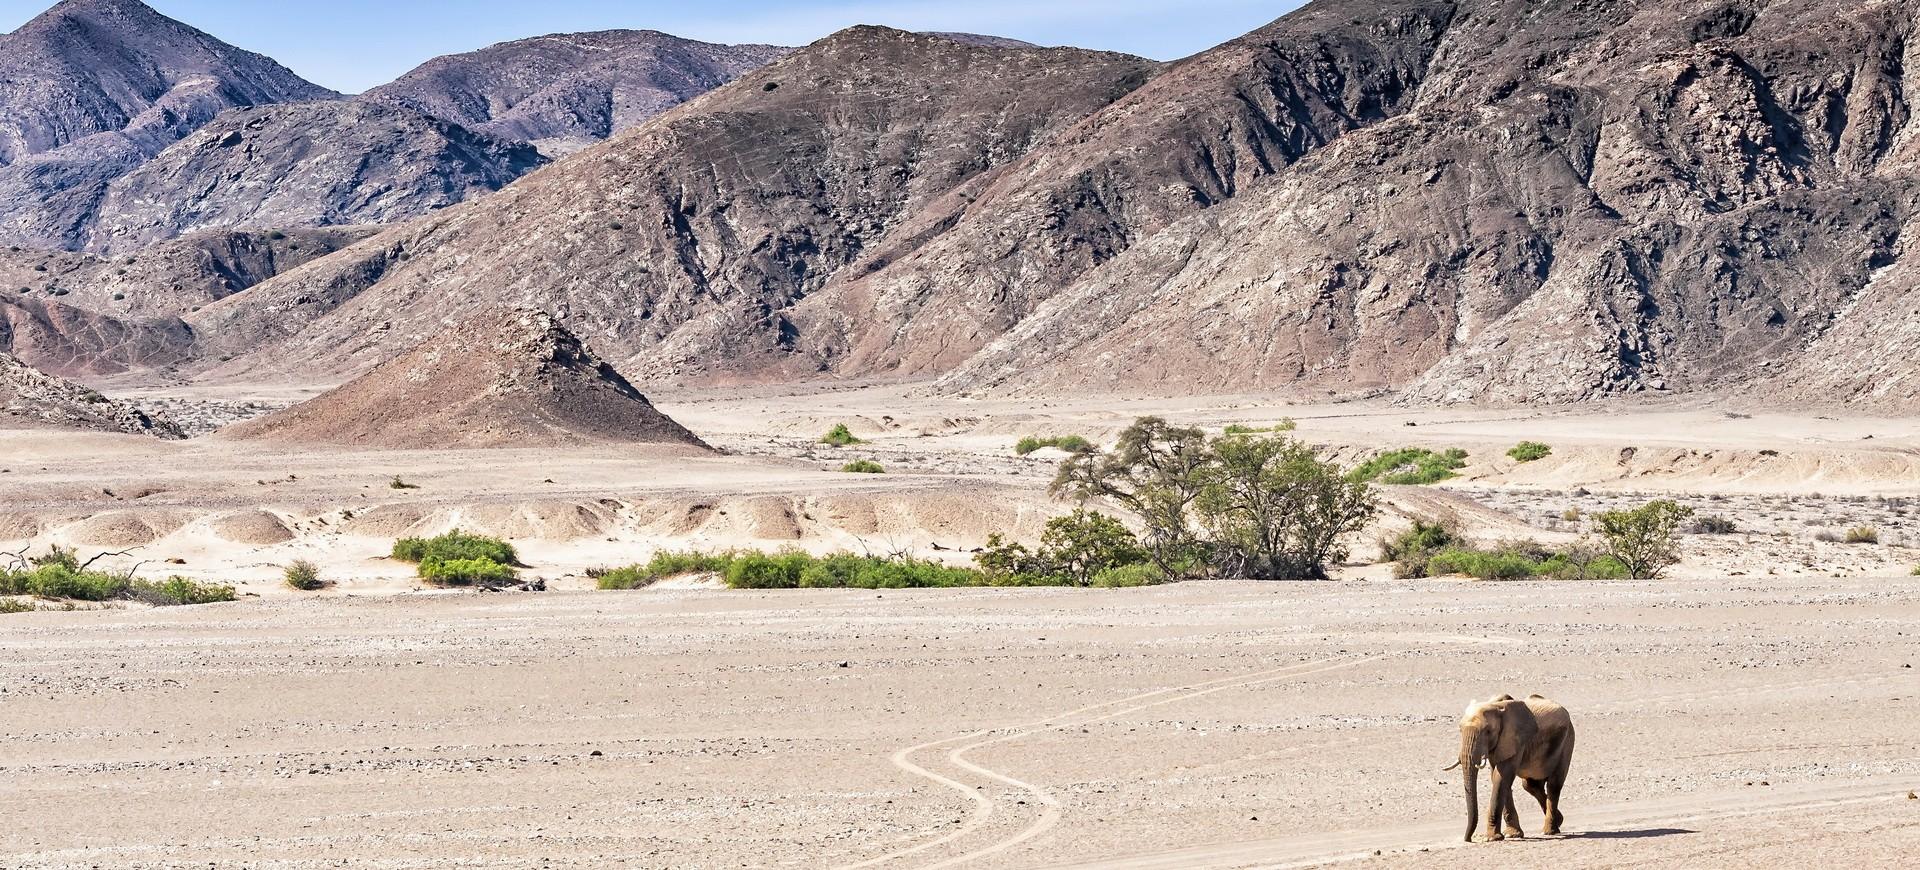 Namibie Damaraland Kunene Eléphant sauvage du désert